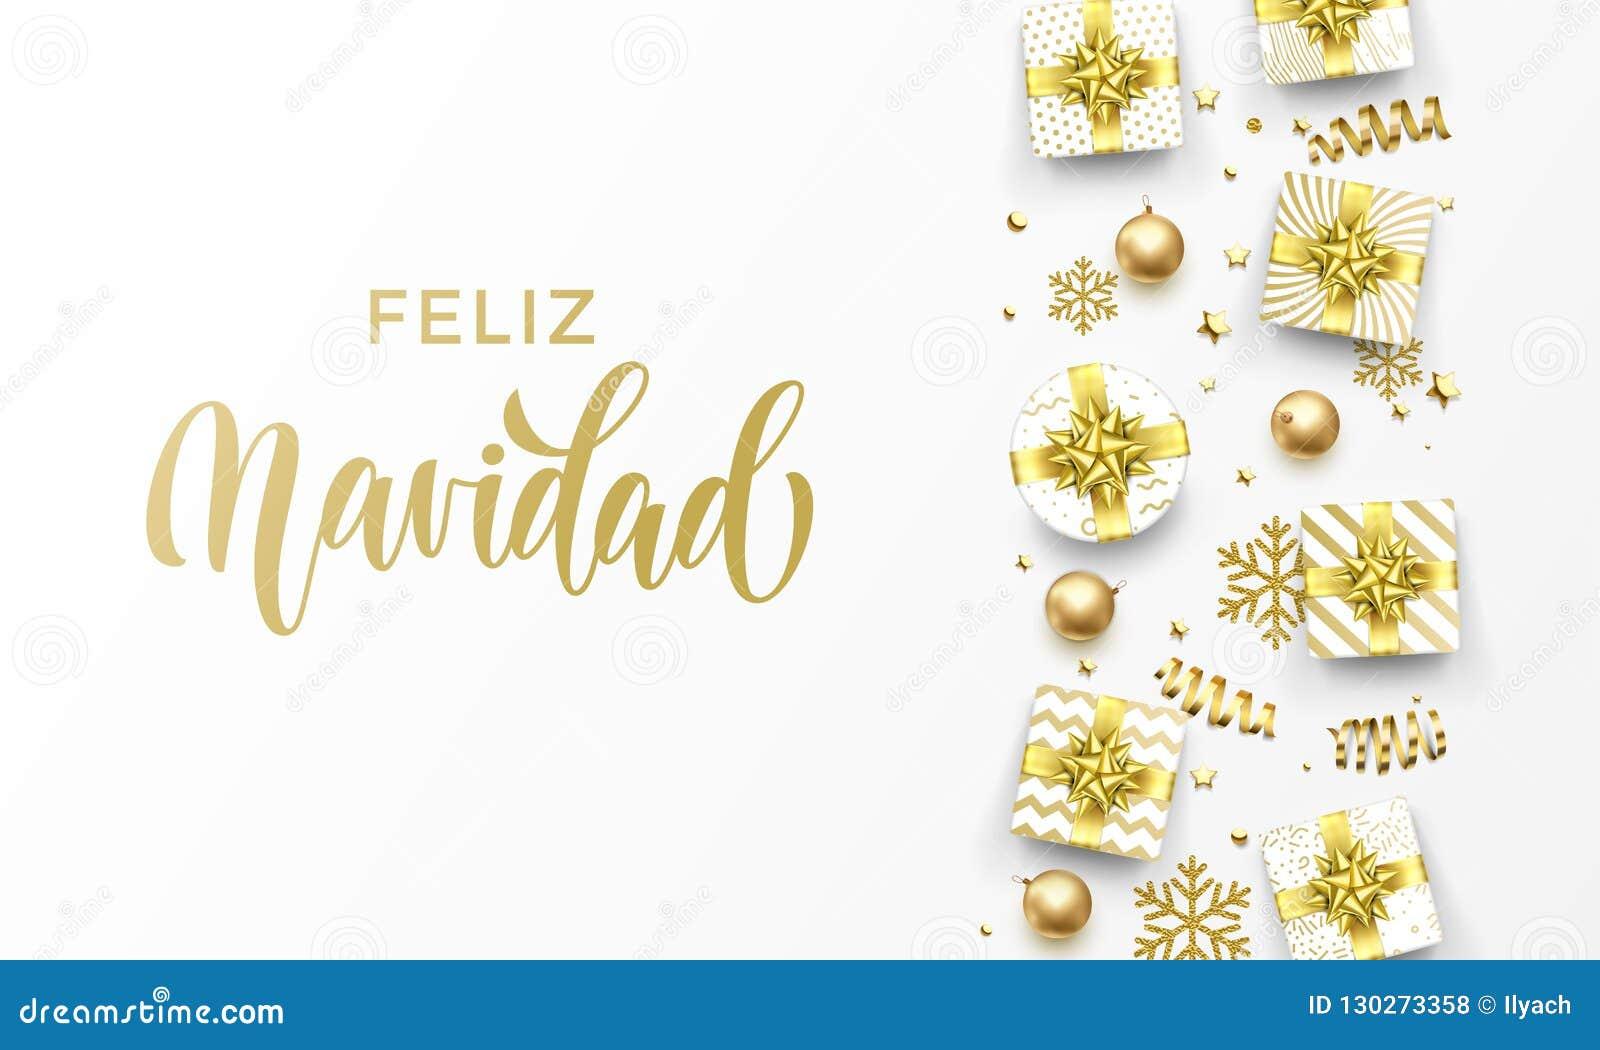 Feliz Navidad Merry Christmas Spanish golden greeting card of gold gifts, stars confetti and snowflakes. Vector premium Christmas